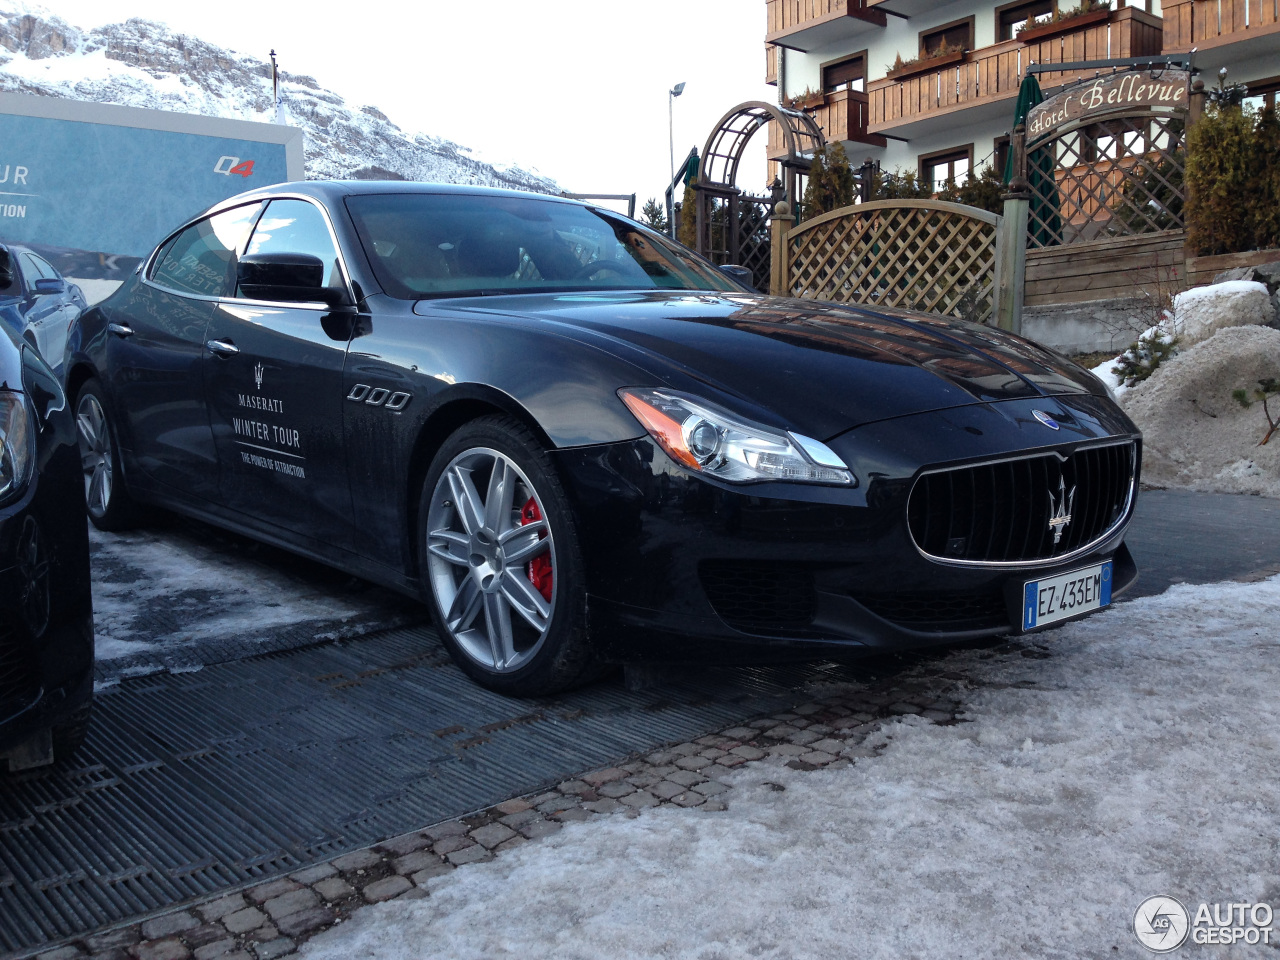 Maserati Quattroporte S Q4 2013 7